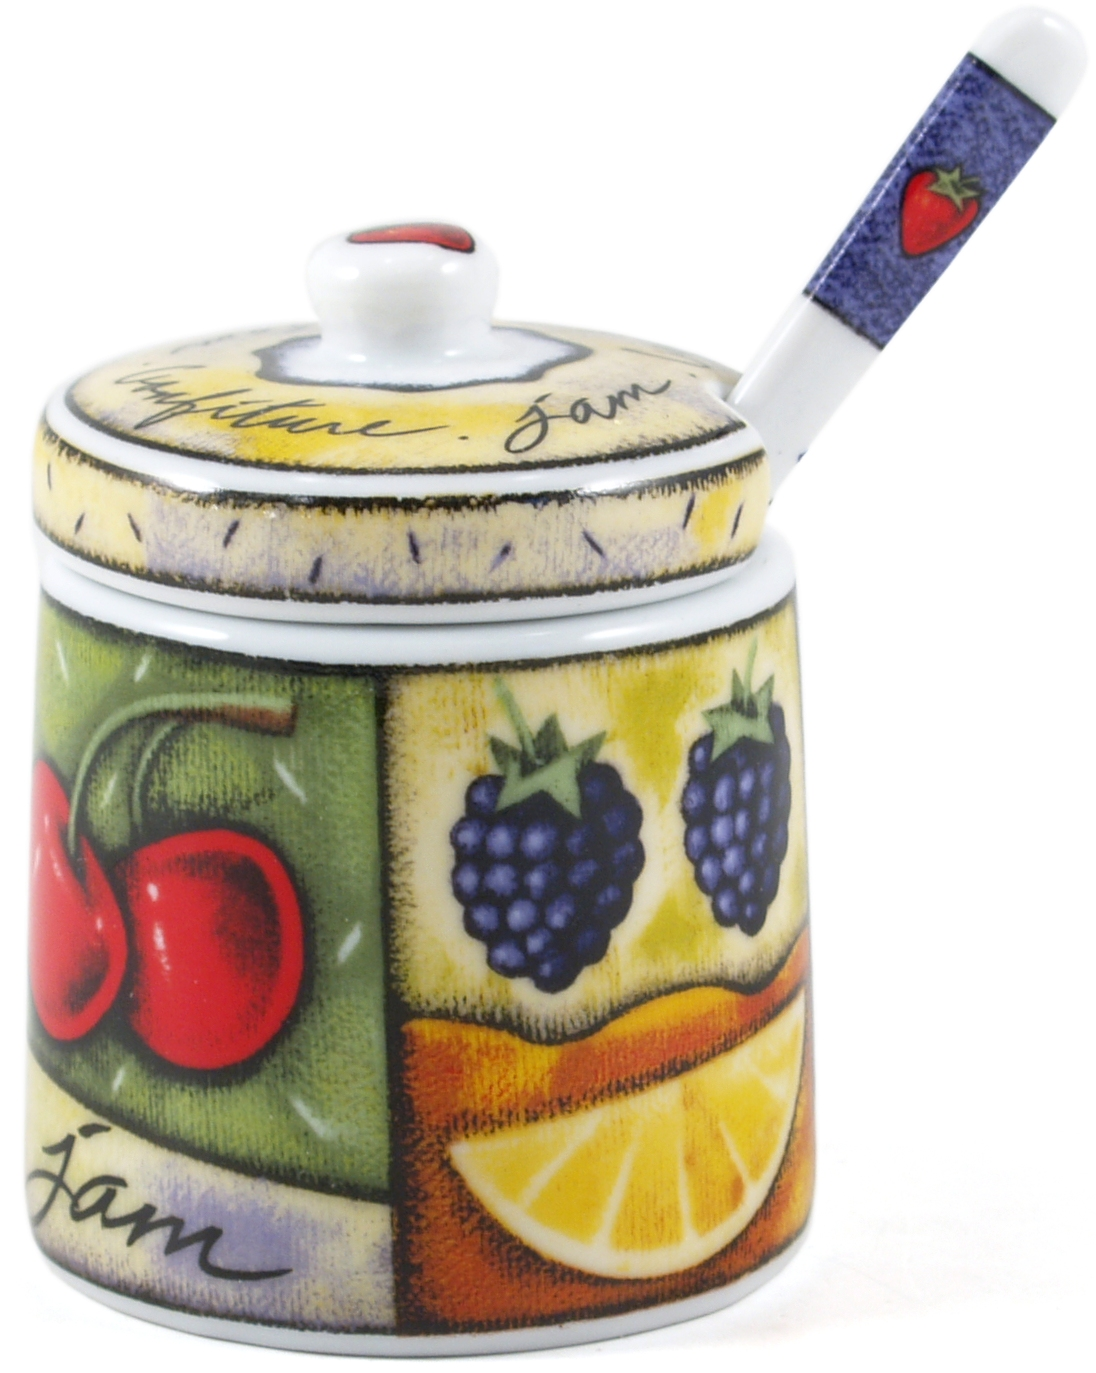 Jo!e Uptown Market Jam Jar and Spoon Set